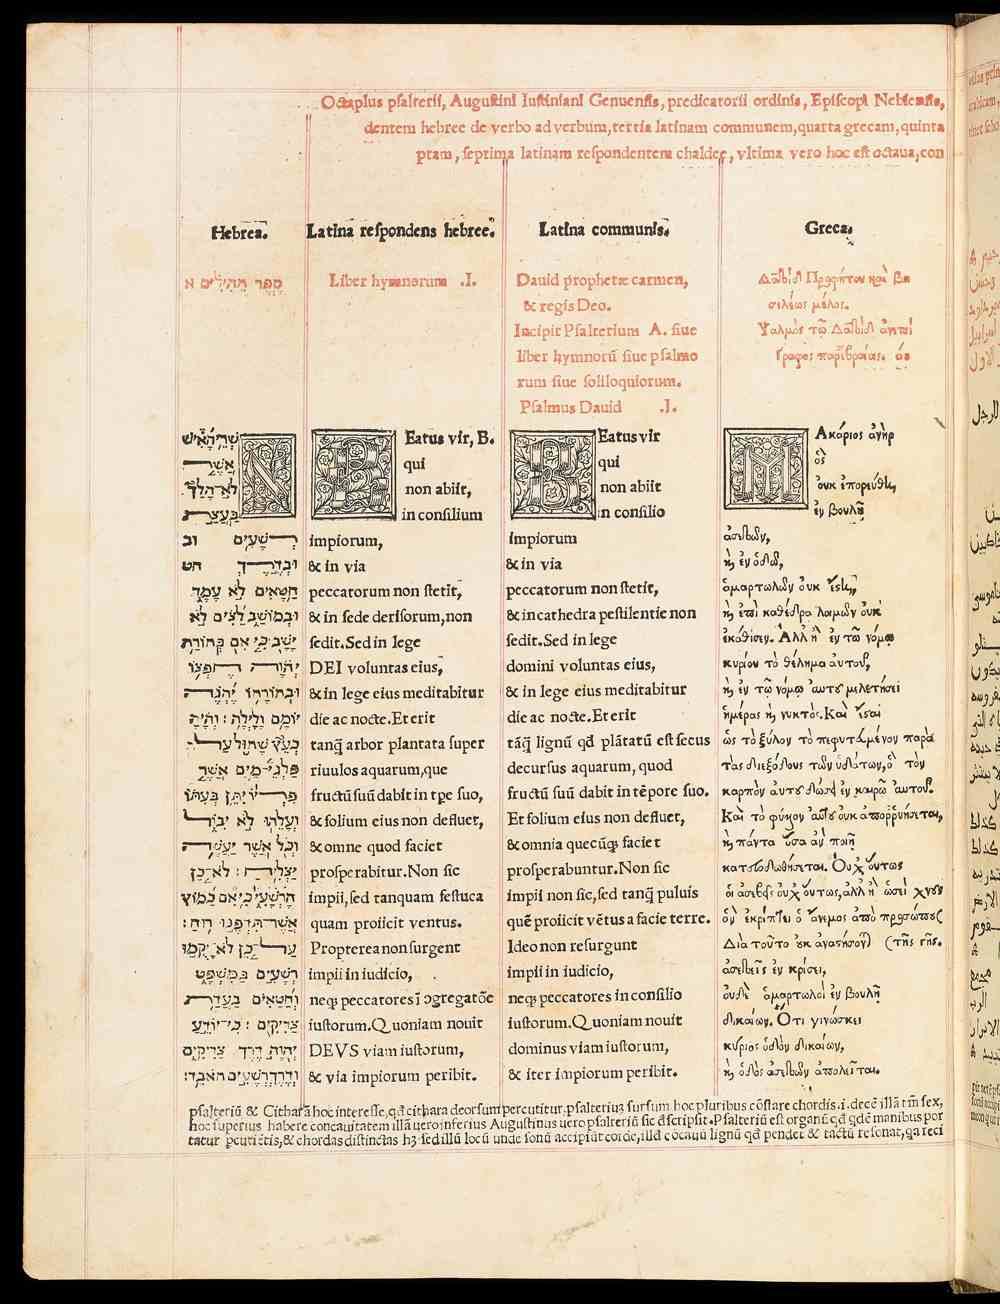 Genoa psalter of 1516.